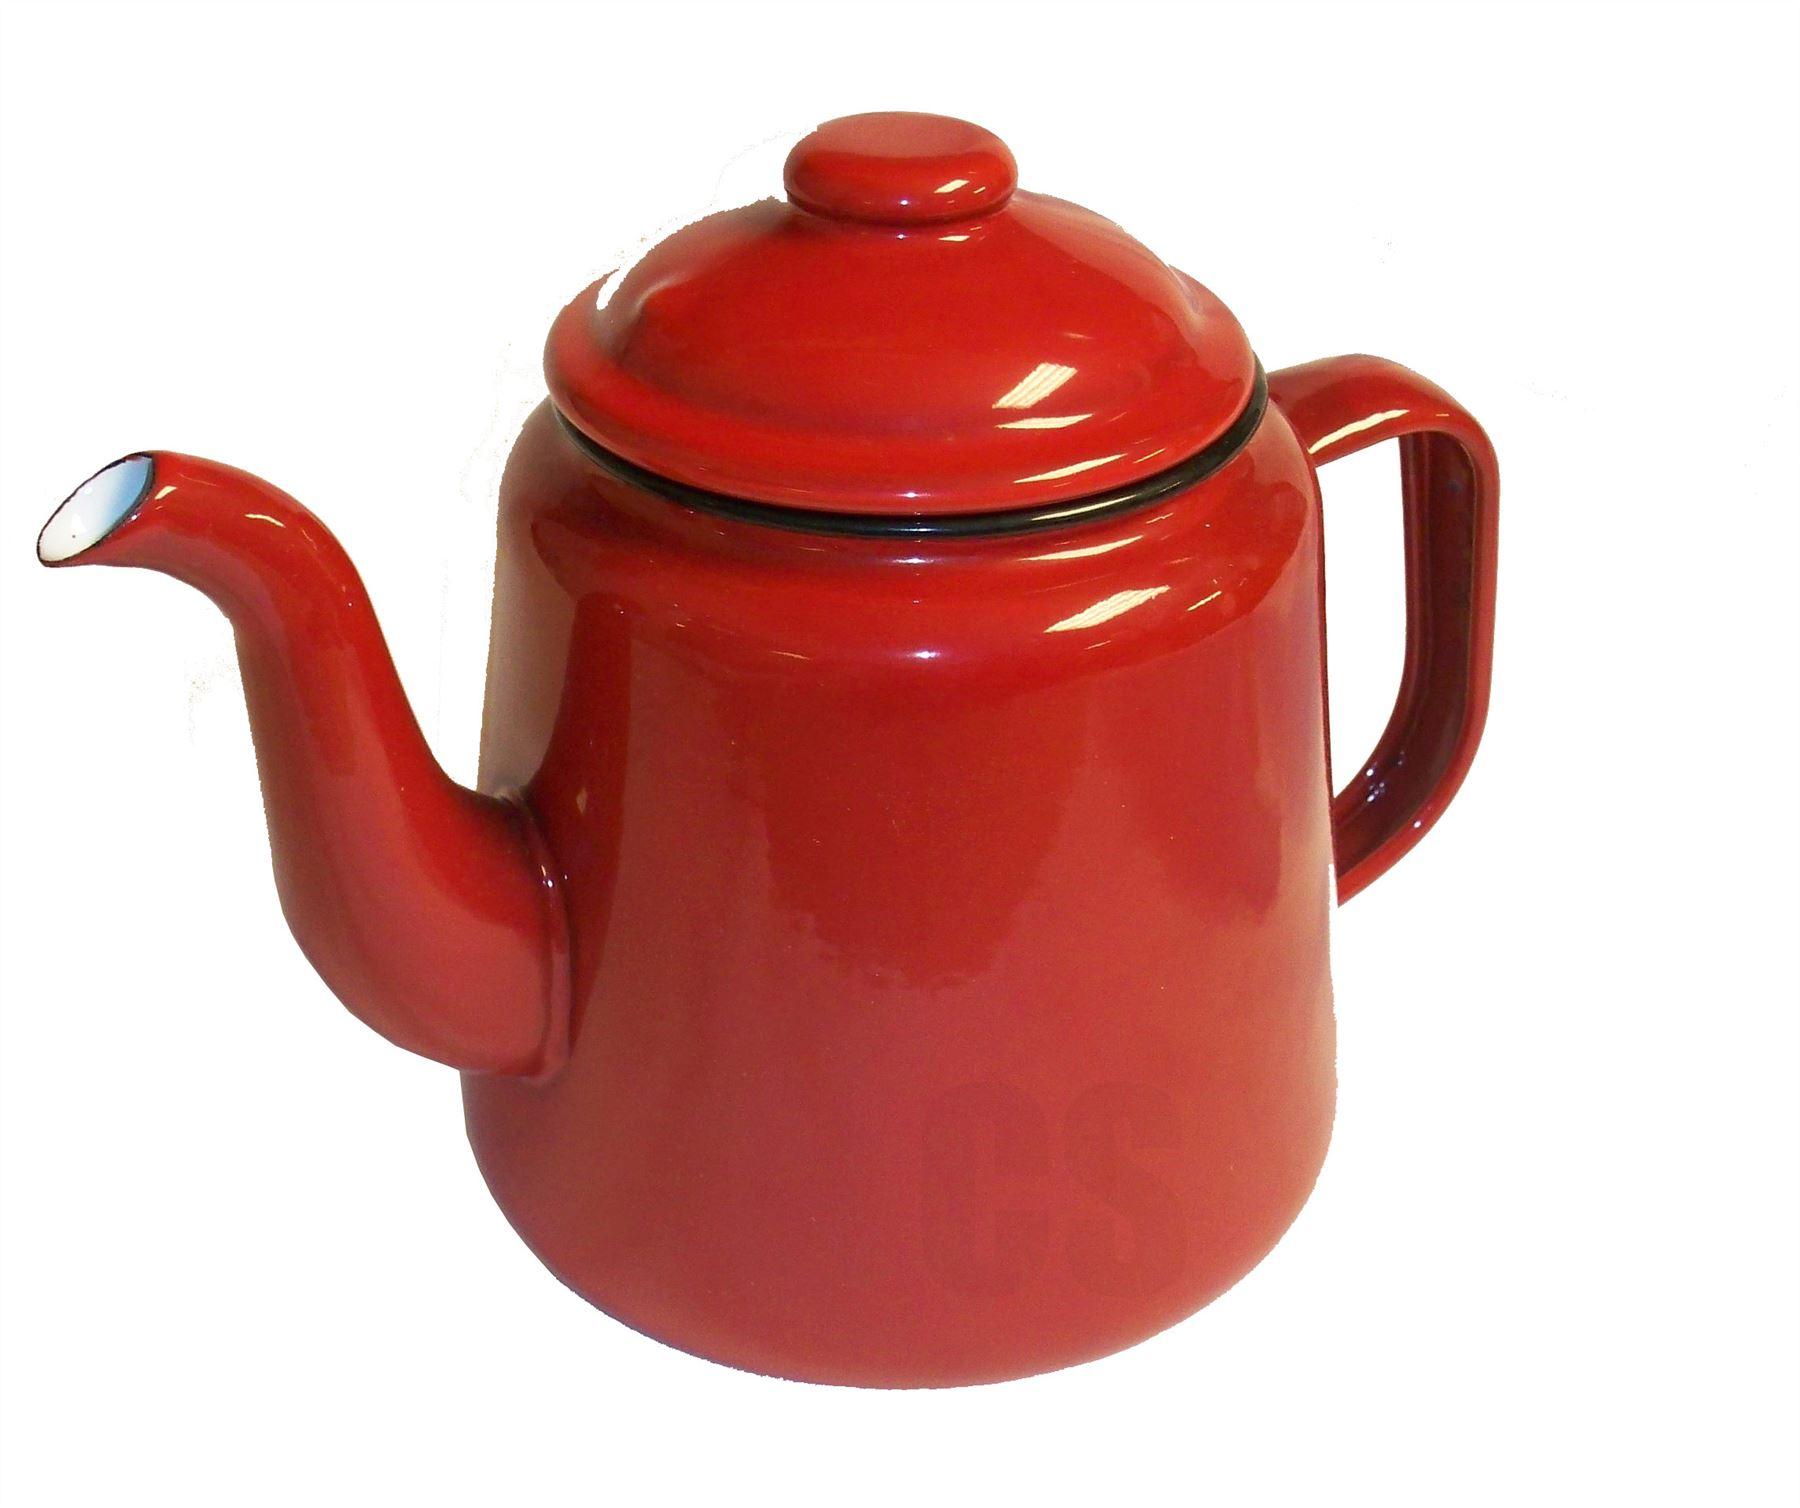 how to clean enamel pot